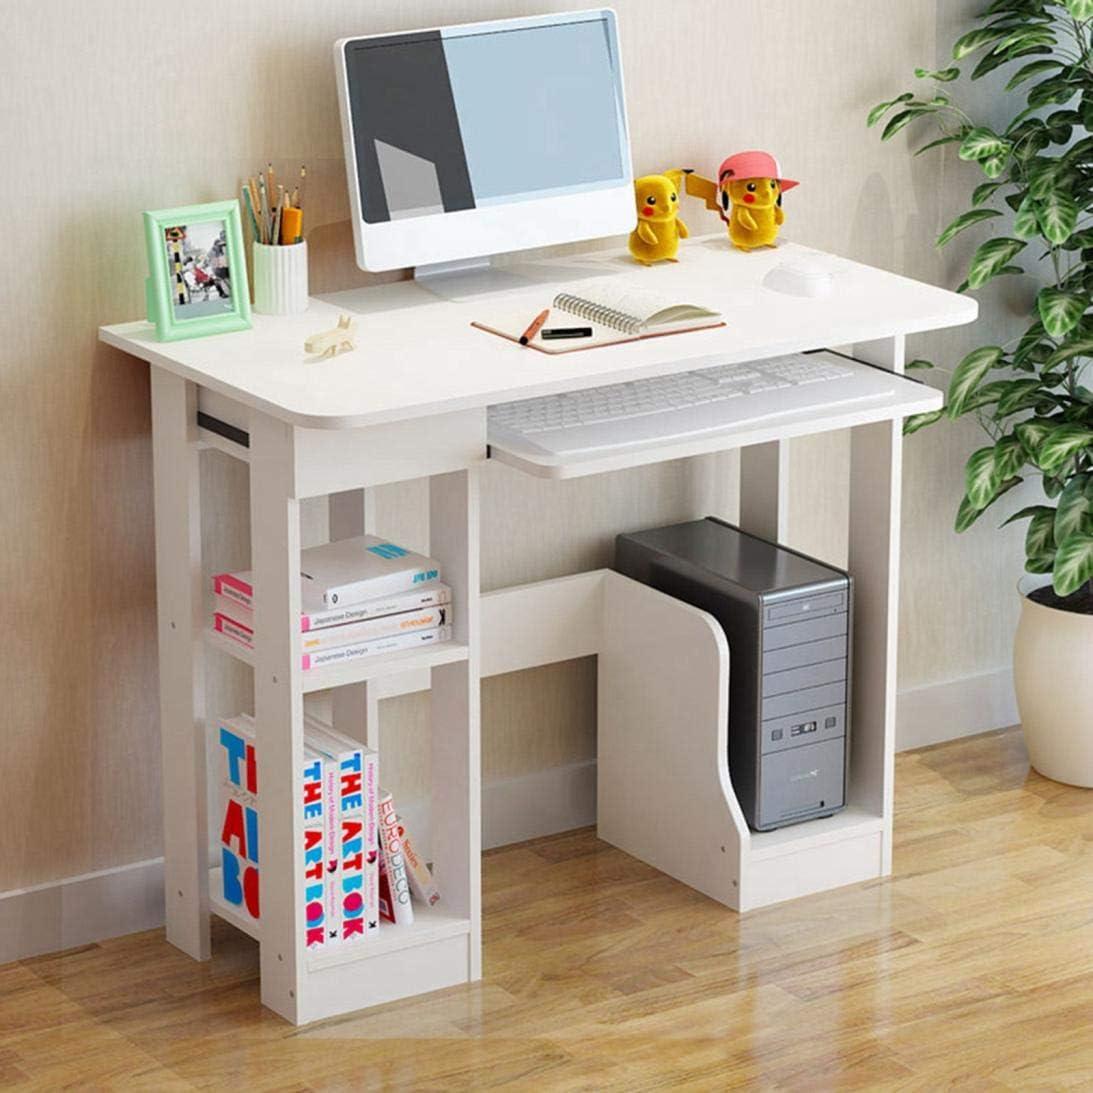 Modern 割引 Minimalist Desk Writing Creative Computer セール特別価格